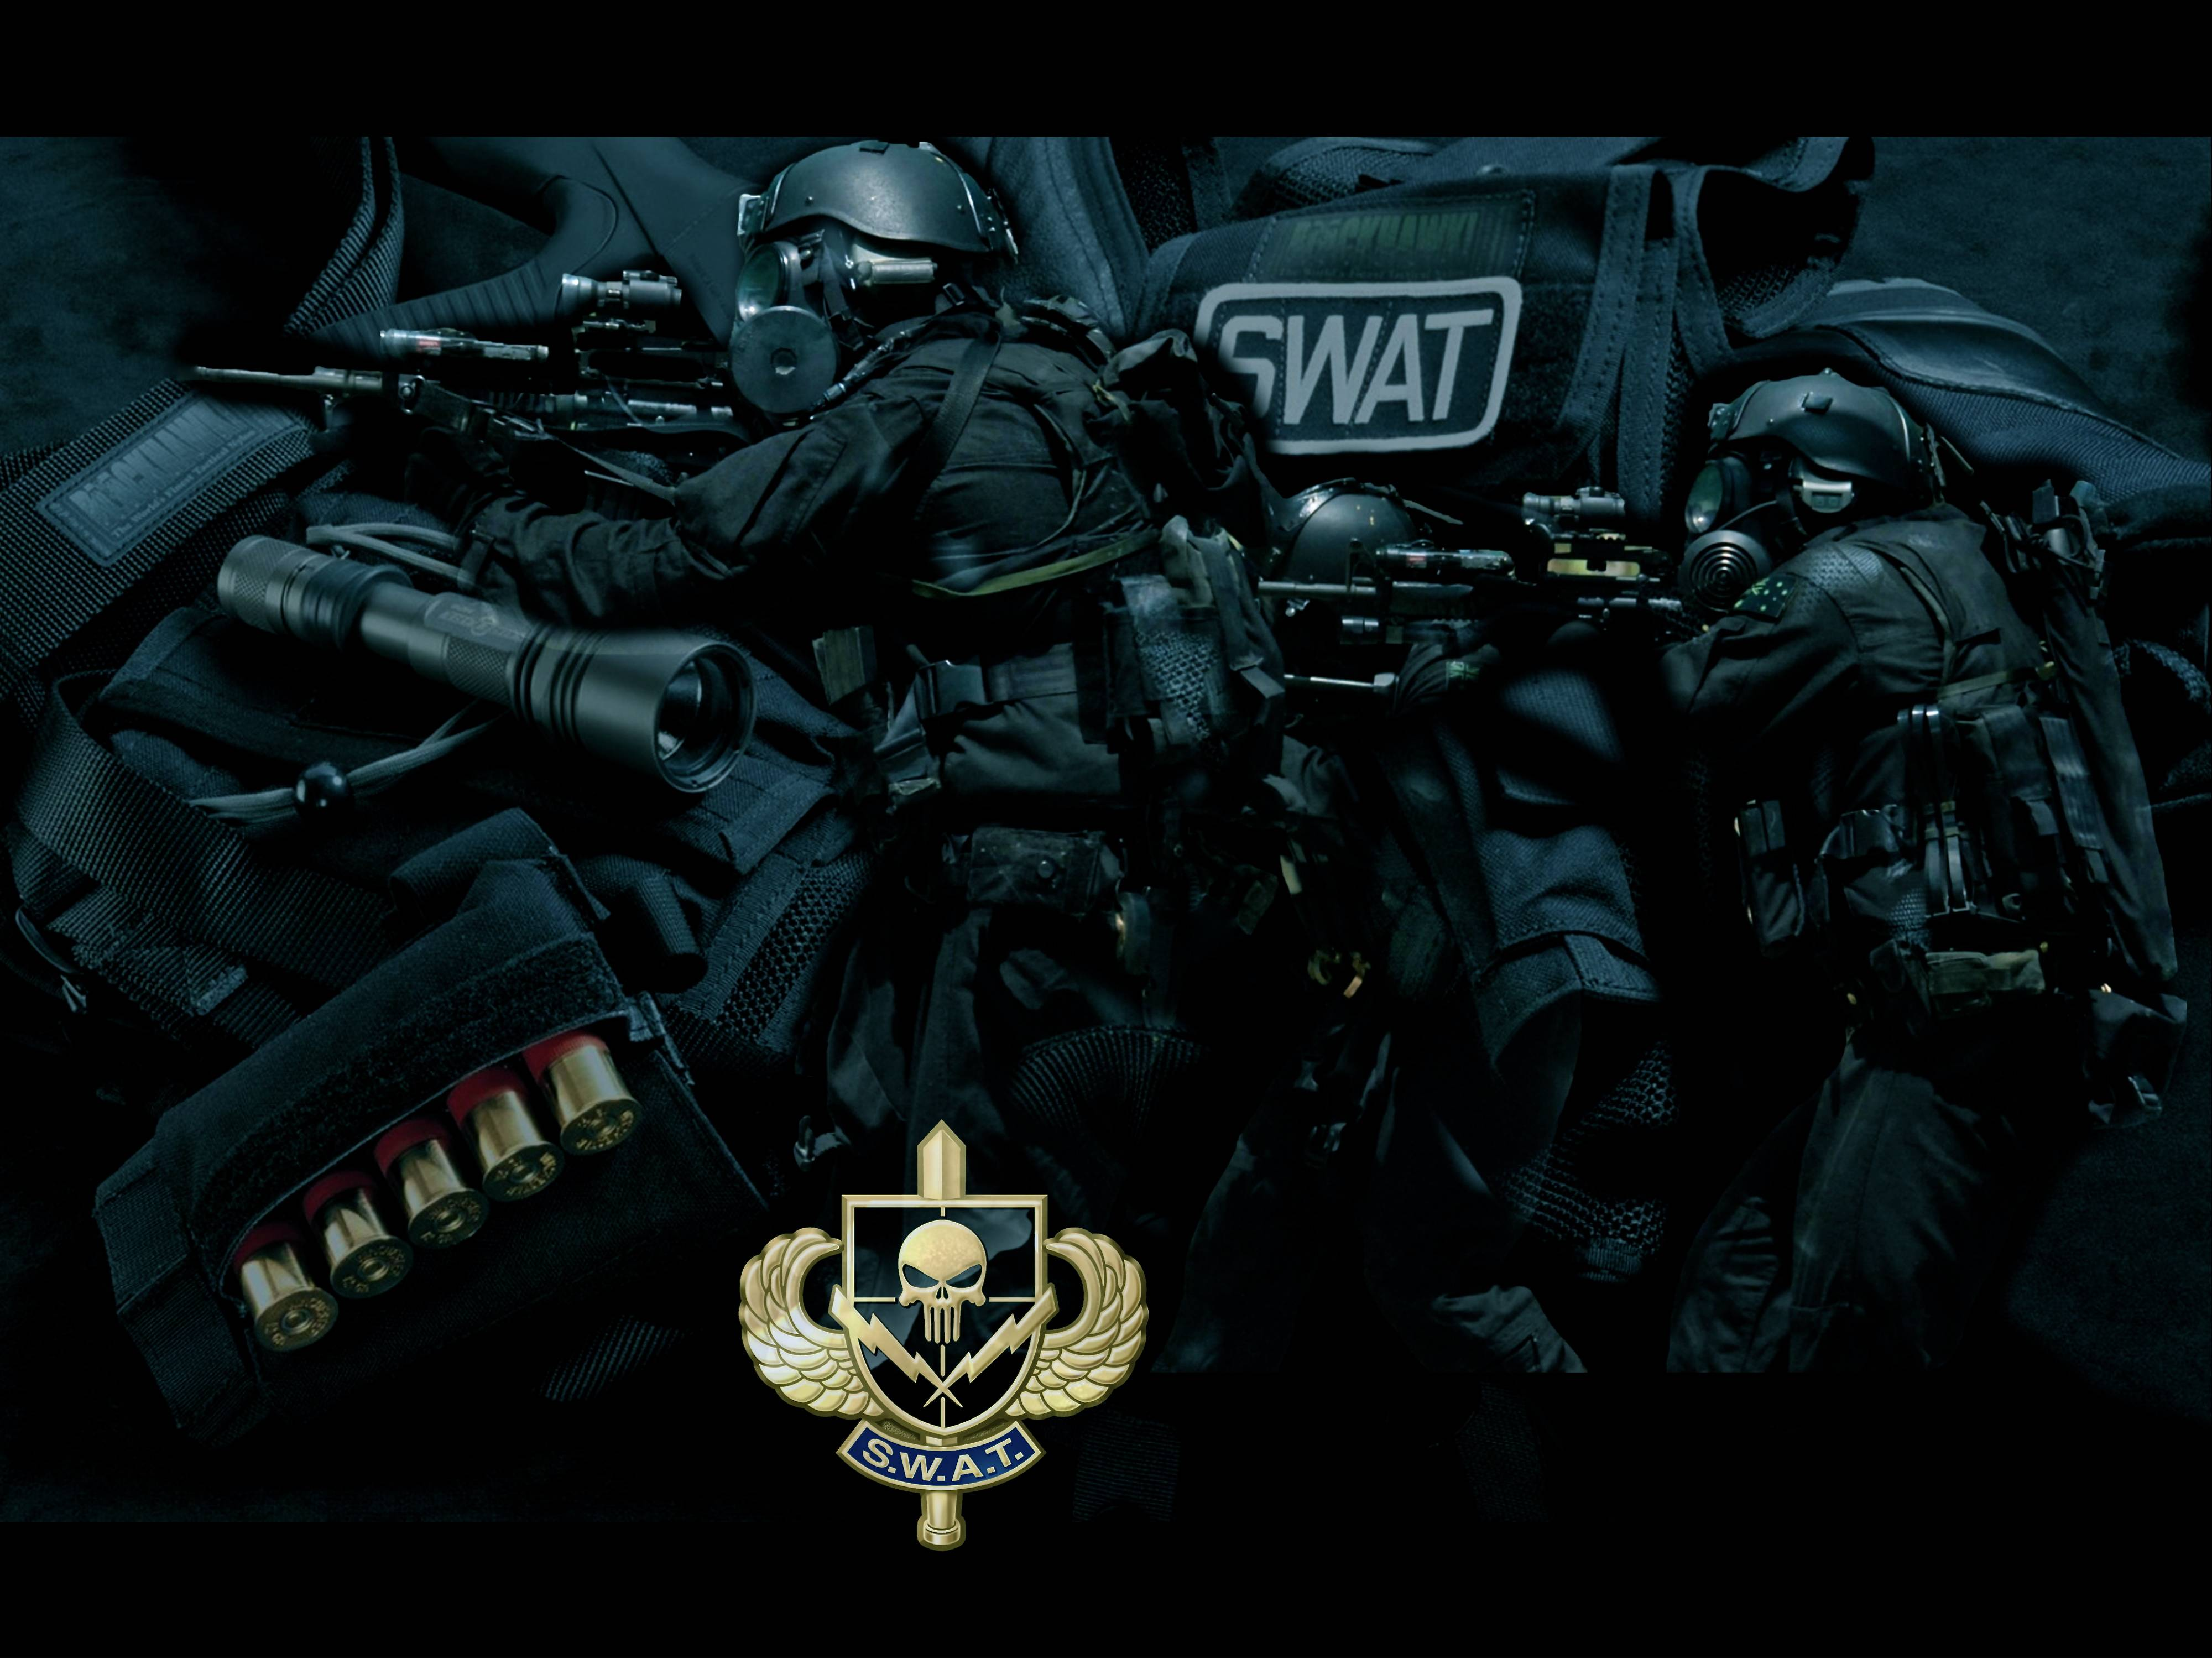 Swat Team Wallpapers 4000x3000